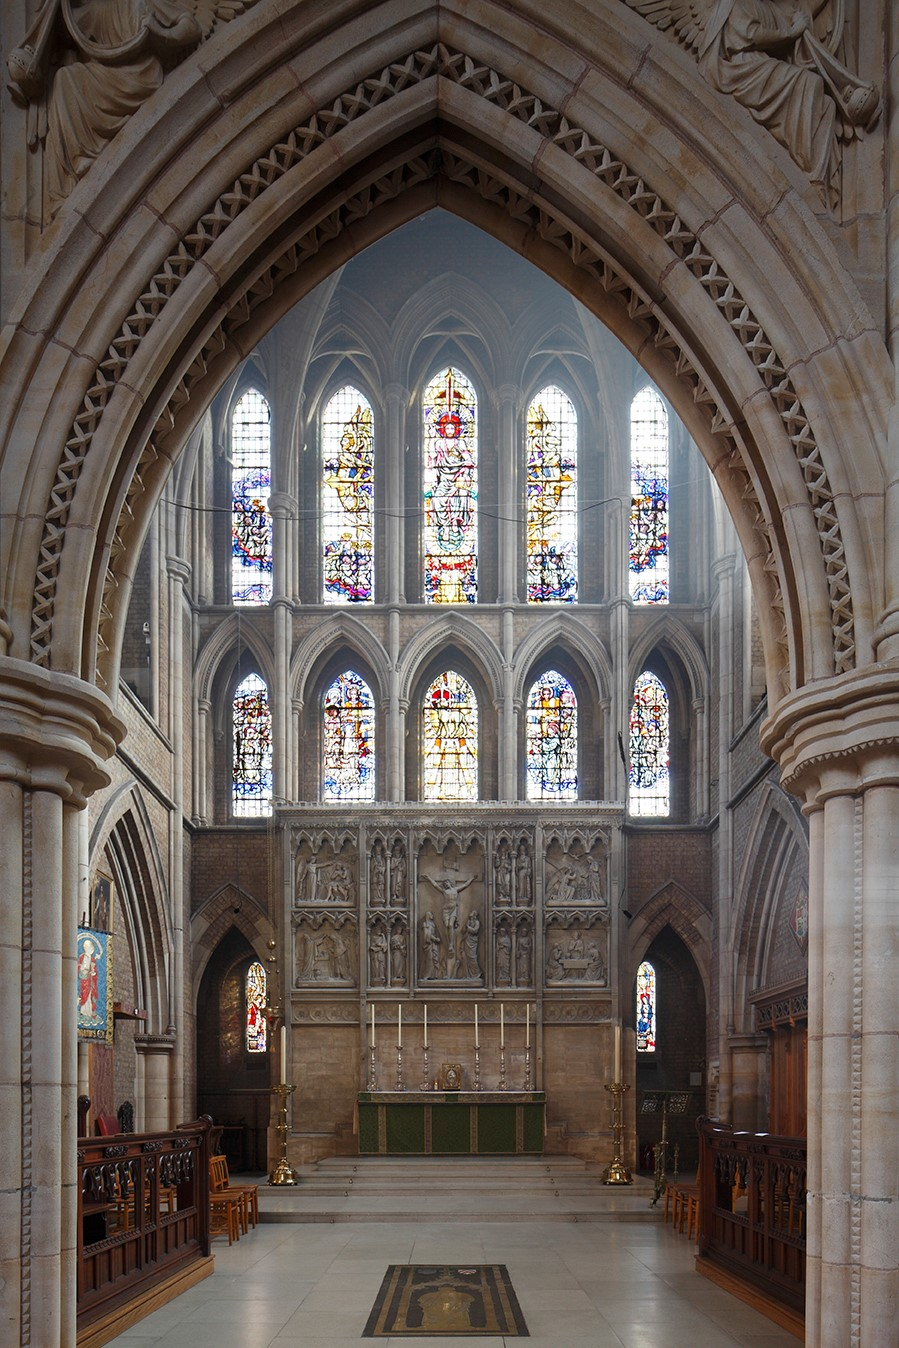 St John the Evangelist, Upper Norwood SE19 2RX Photography - MUST CREDIT (c) James Balston